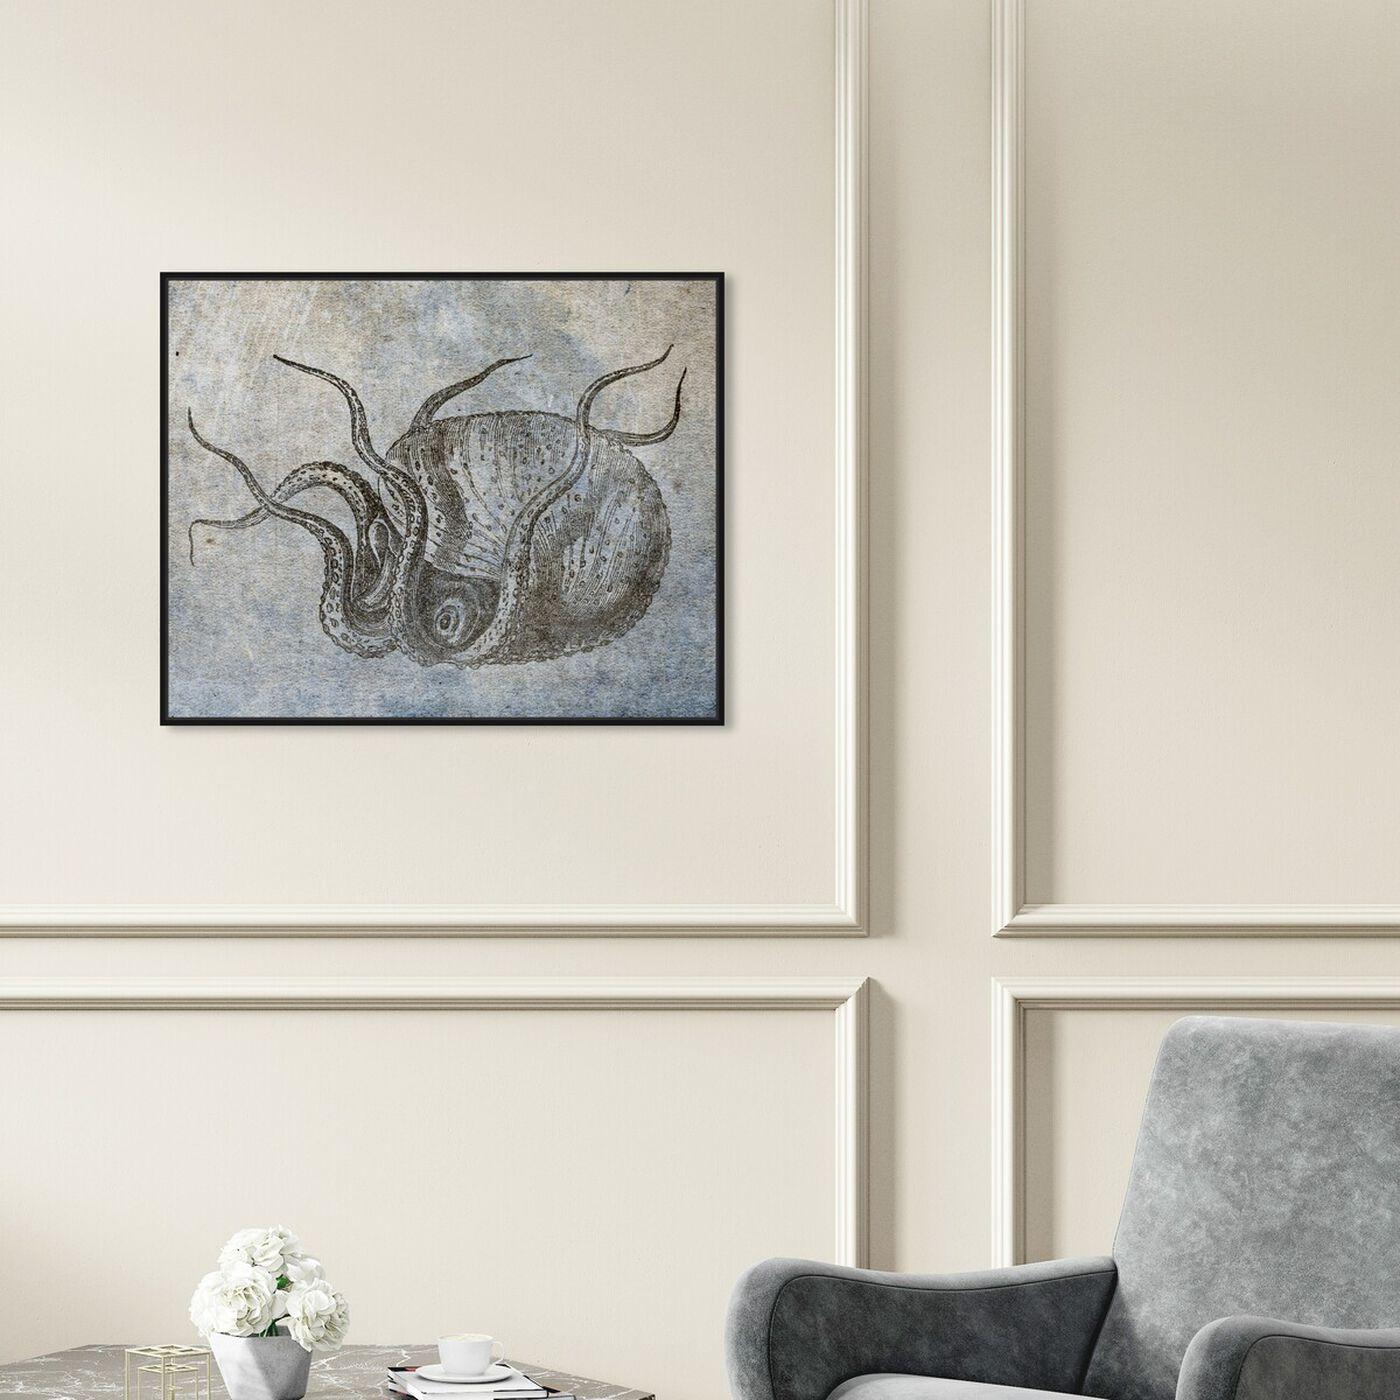 Hanging view of Nautilus featuring nautical and coastal and marine life art.